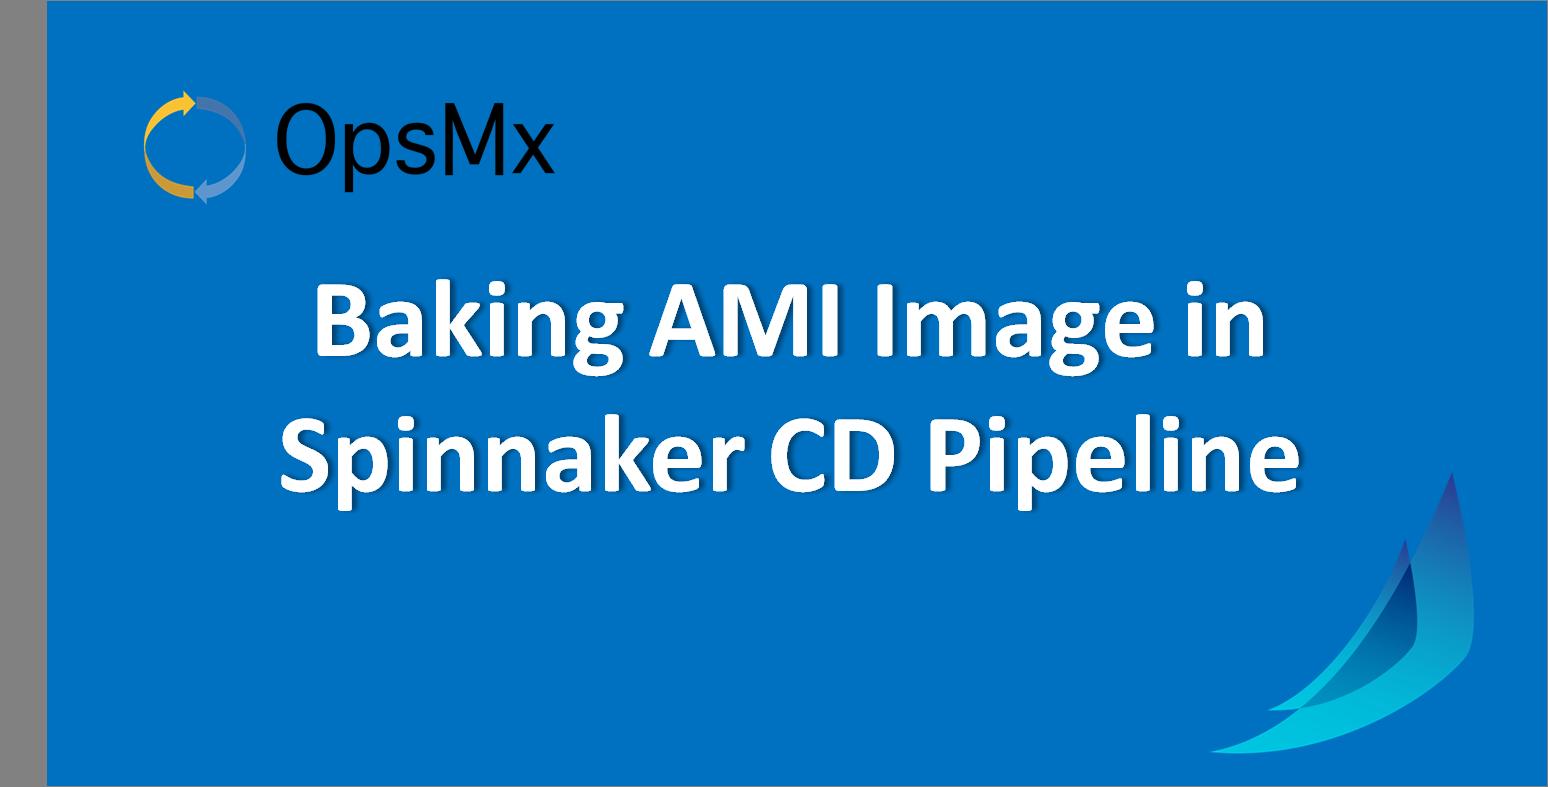 Baking AMI Image in Spinnaker CD Pipeline